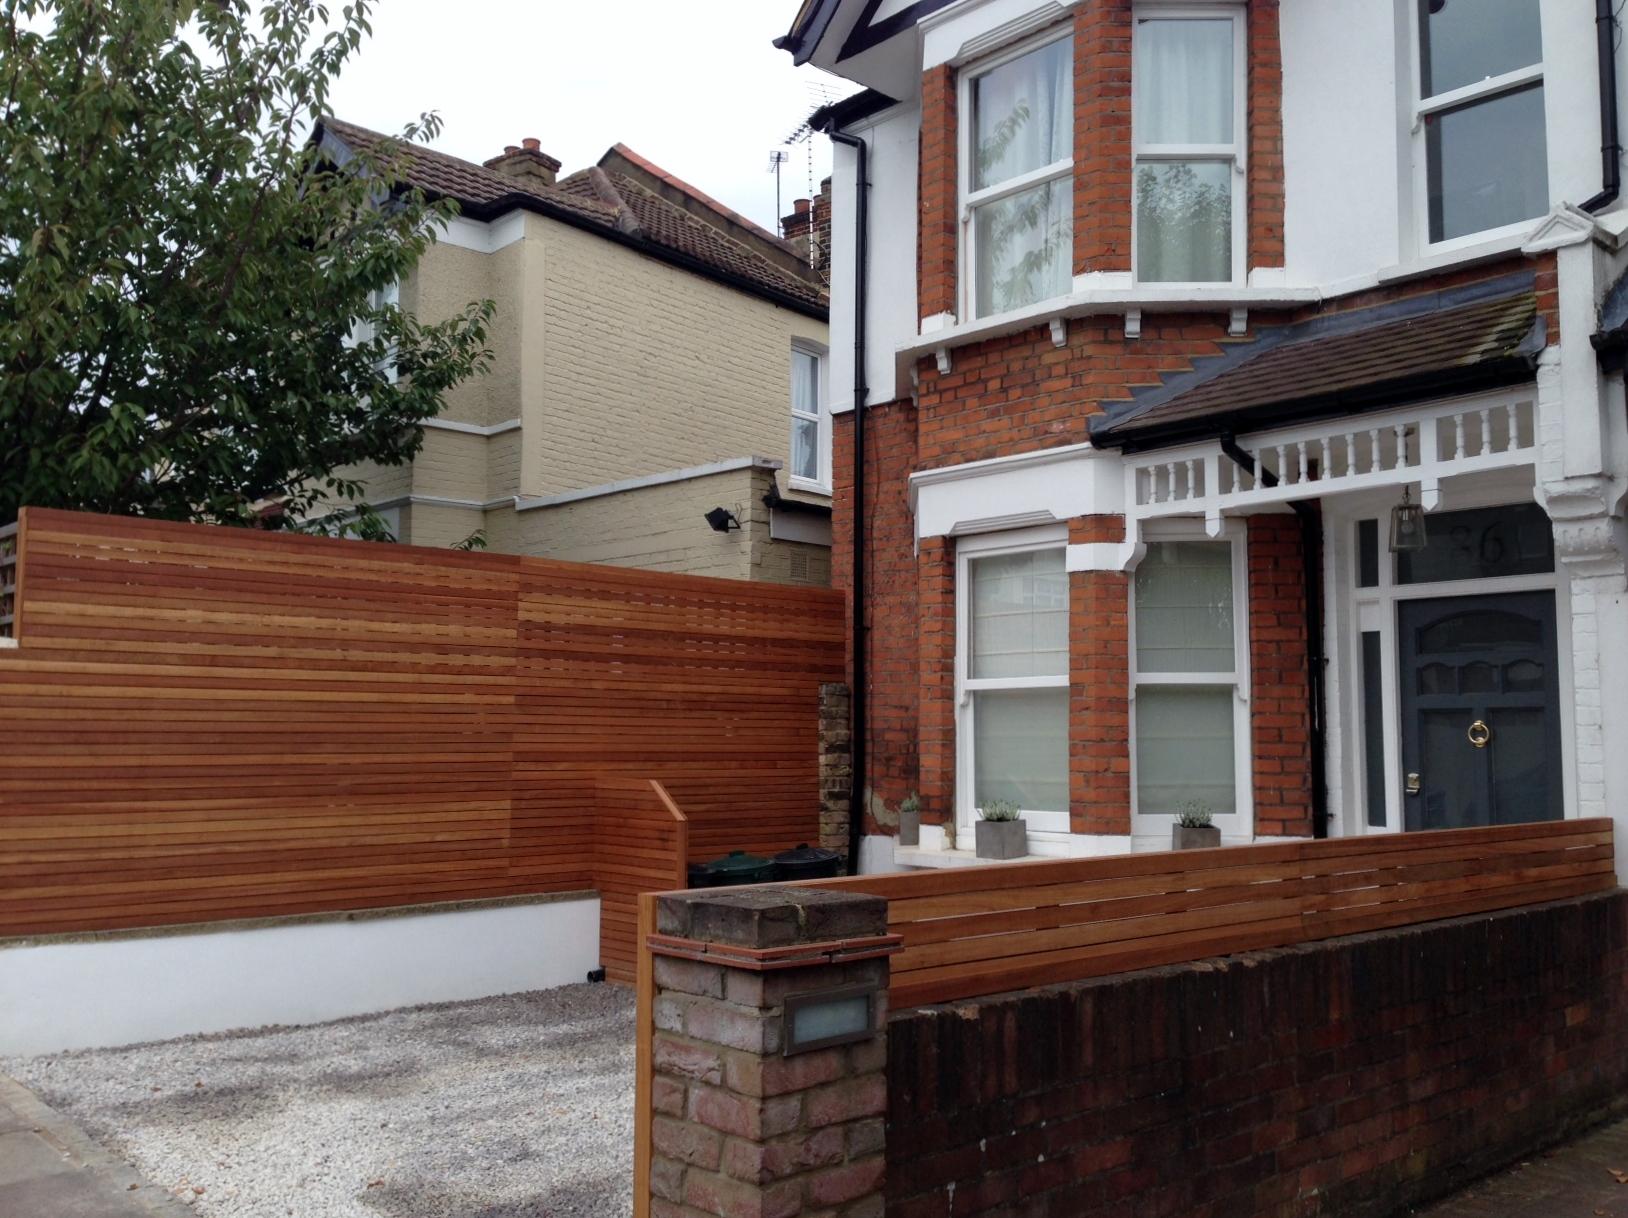 front garden drivewat gravel travertine paving path hardwood privacy screen trellis tooting london (22)